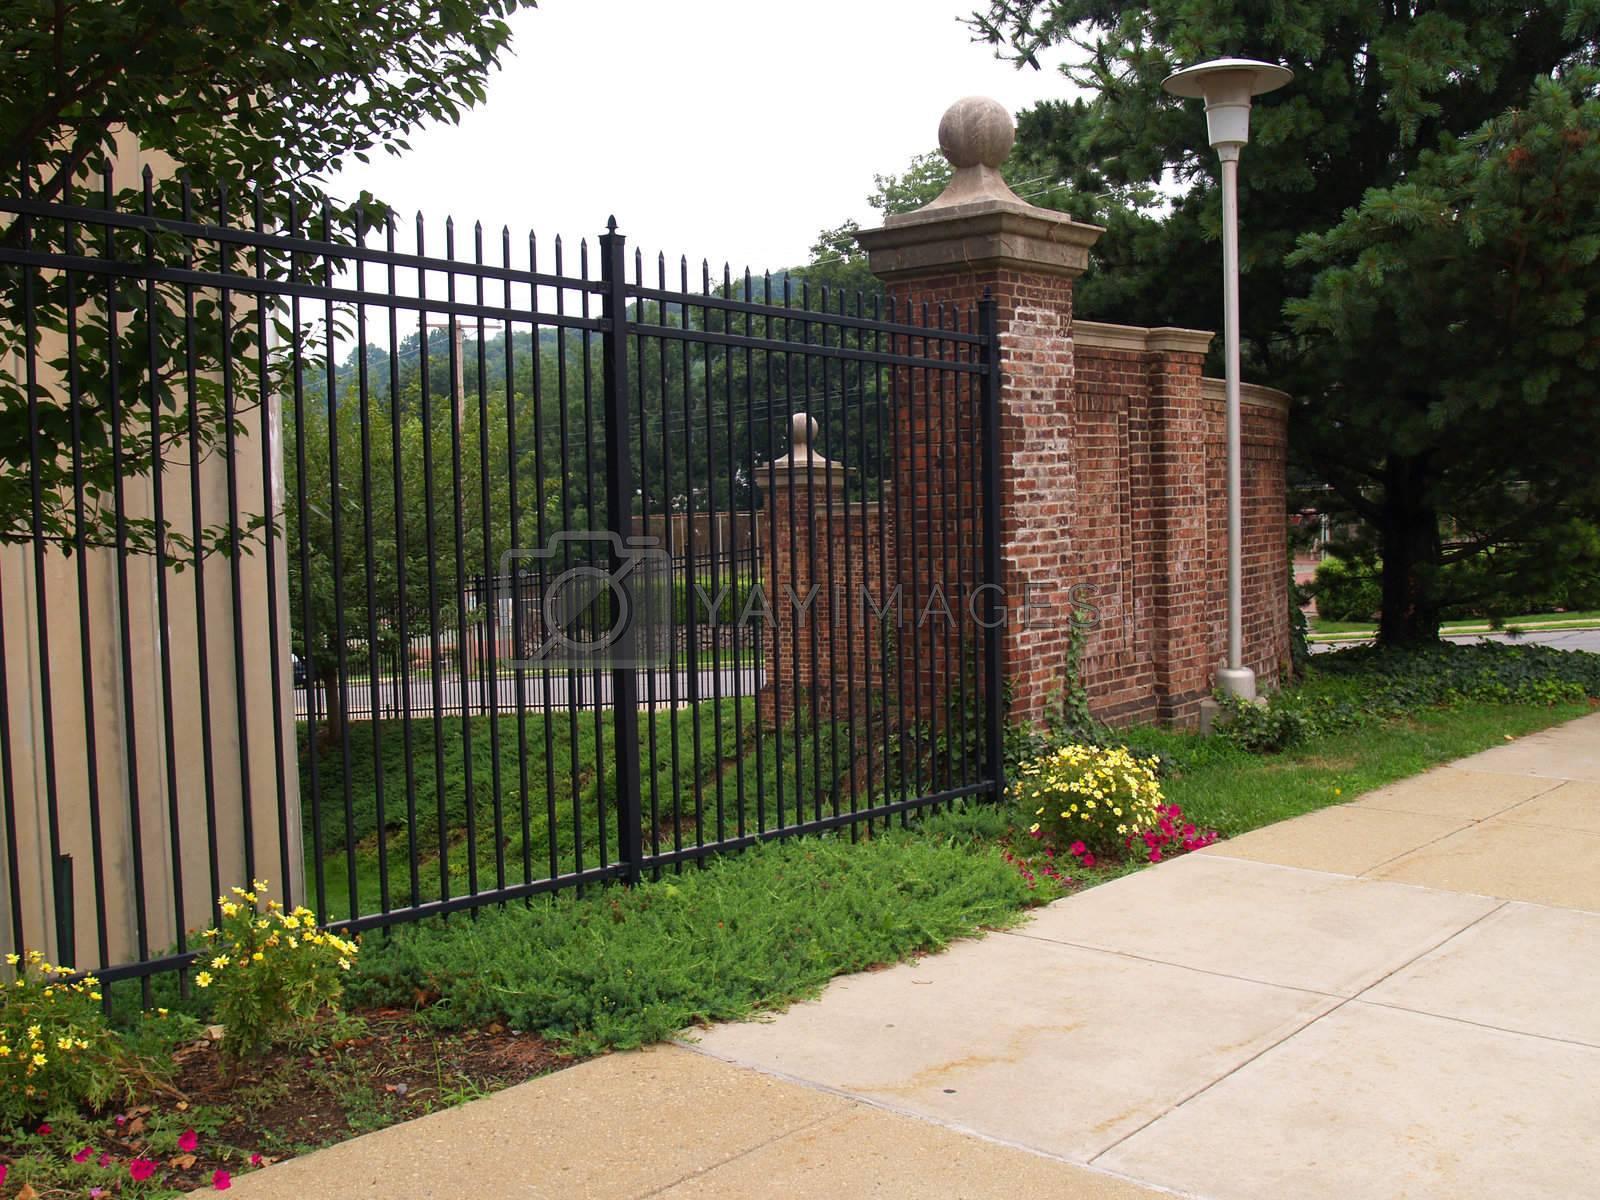 tall black iron fence and a brick cornerpiece